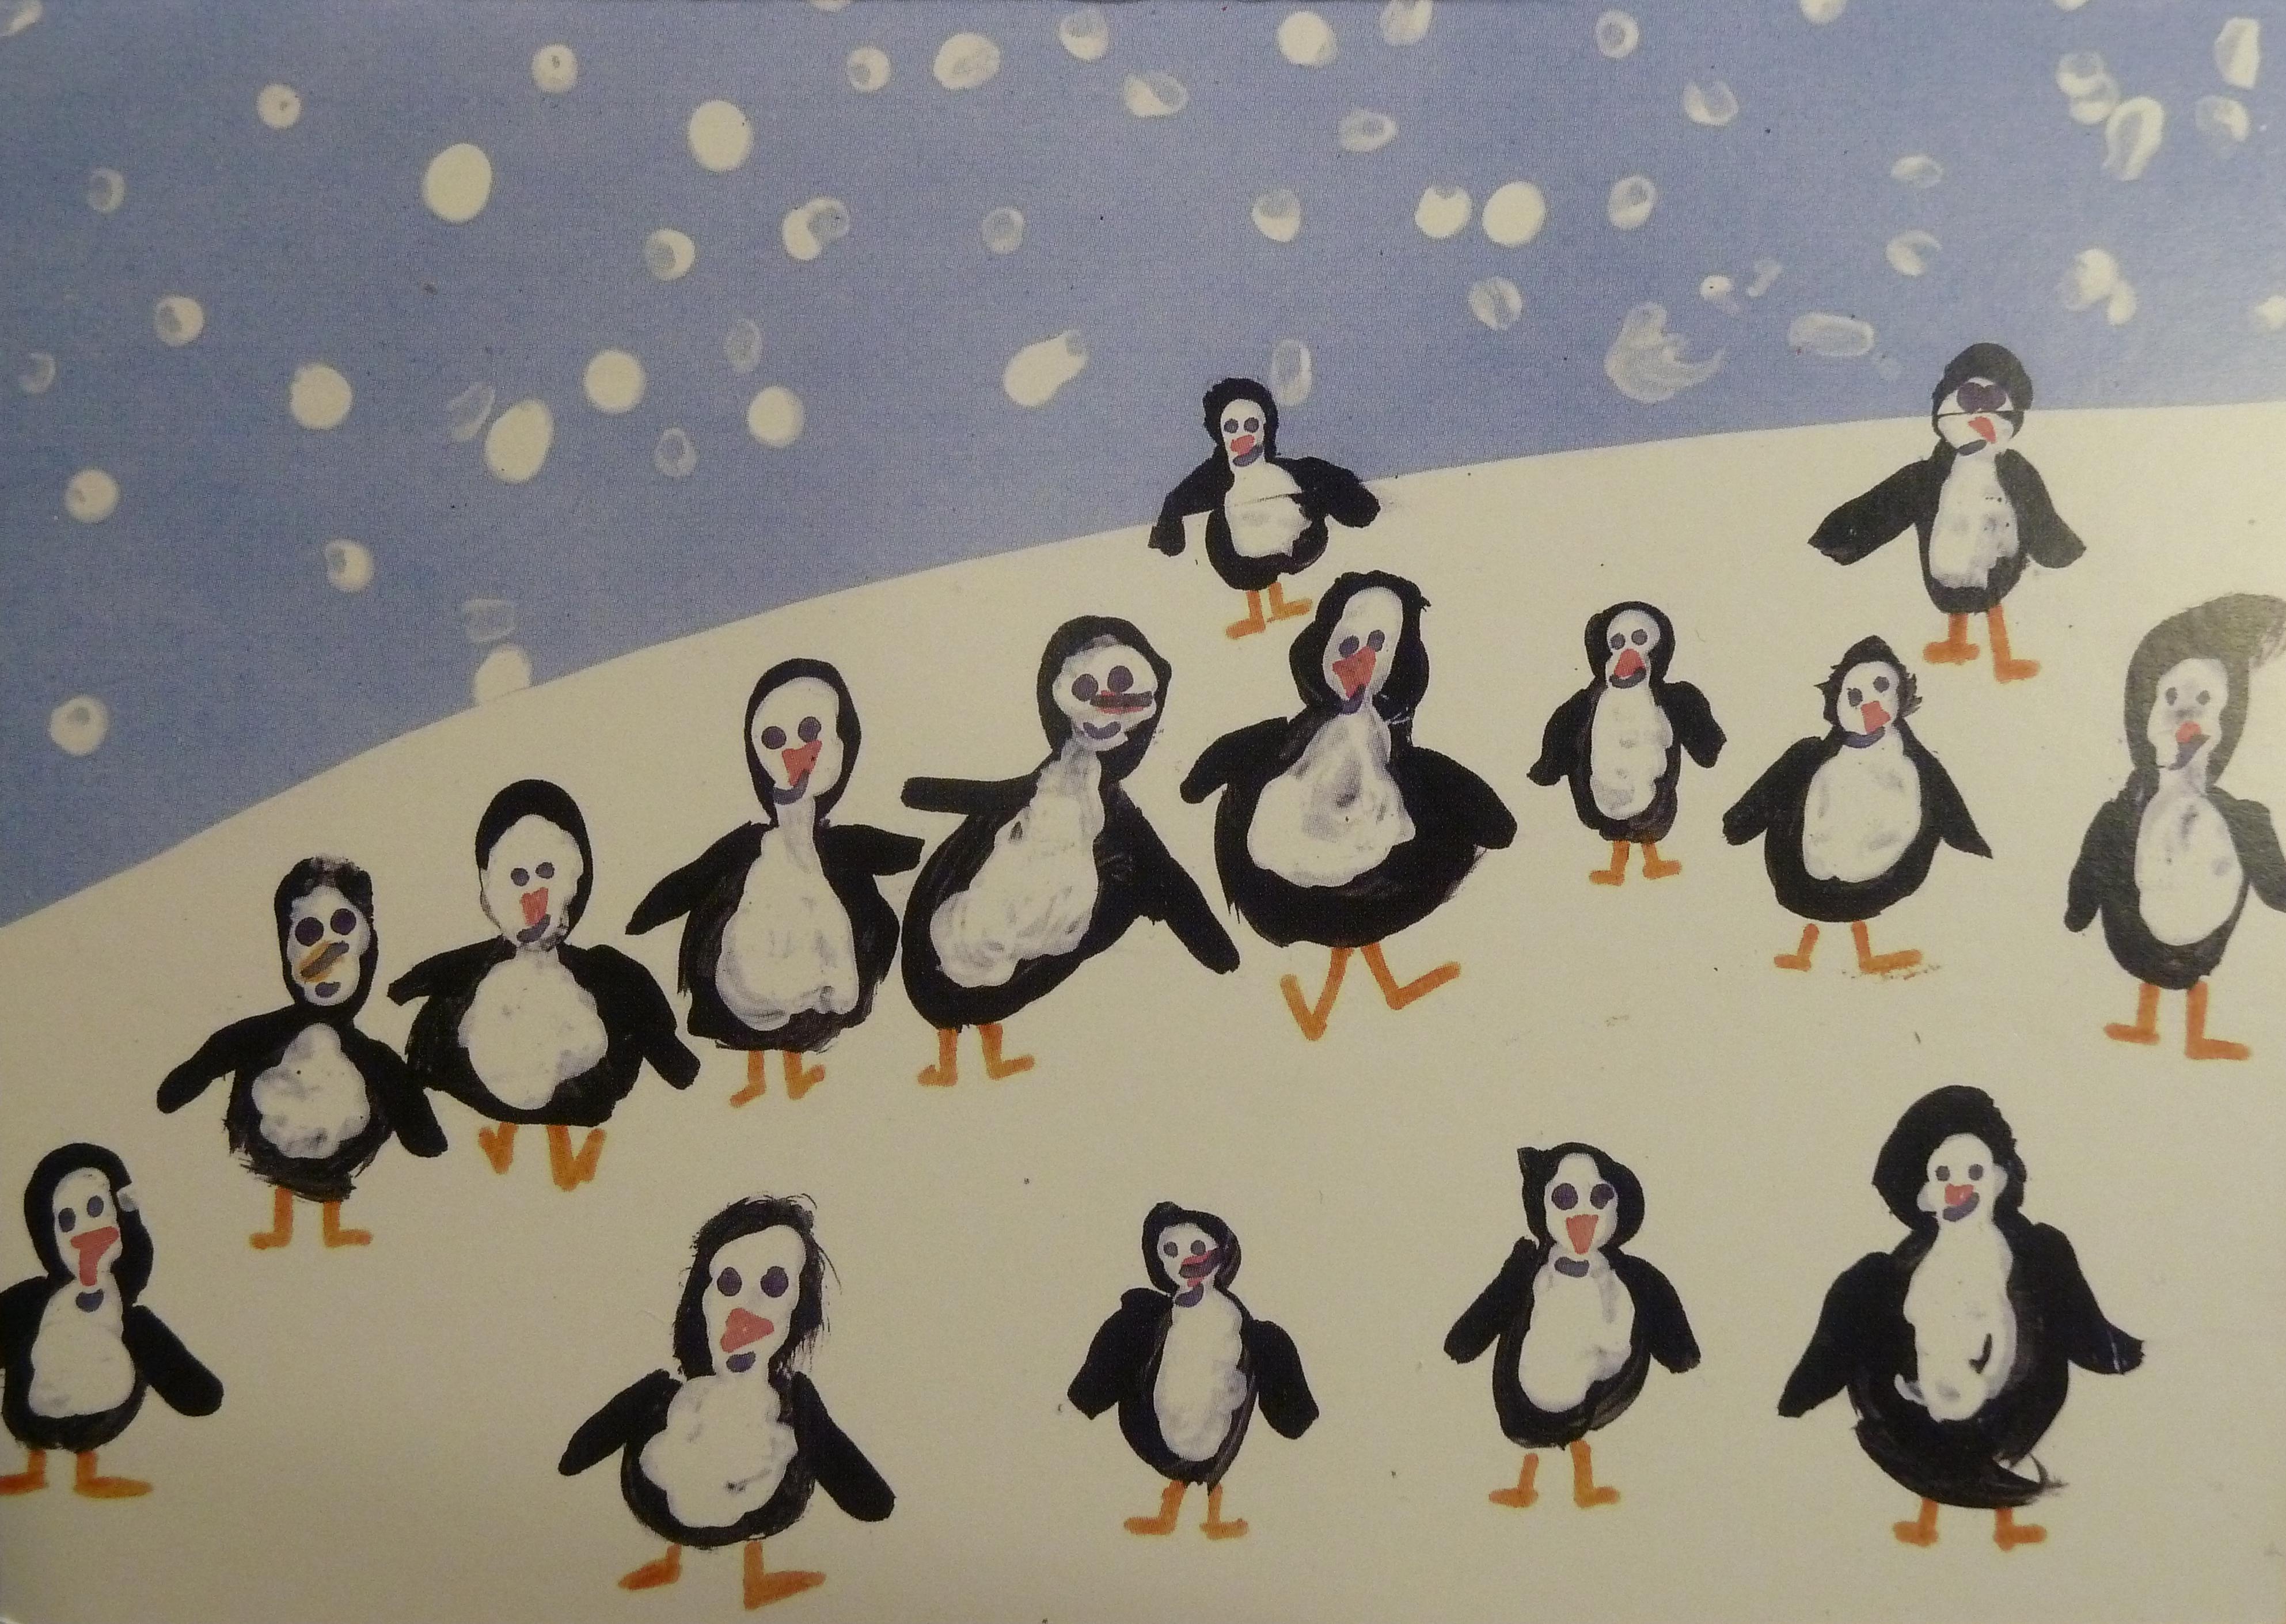 Joseph McIntyre's 2010 Christmas card design